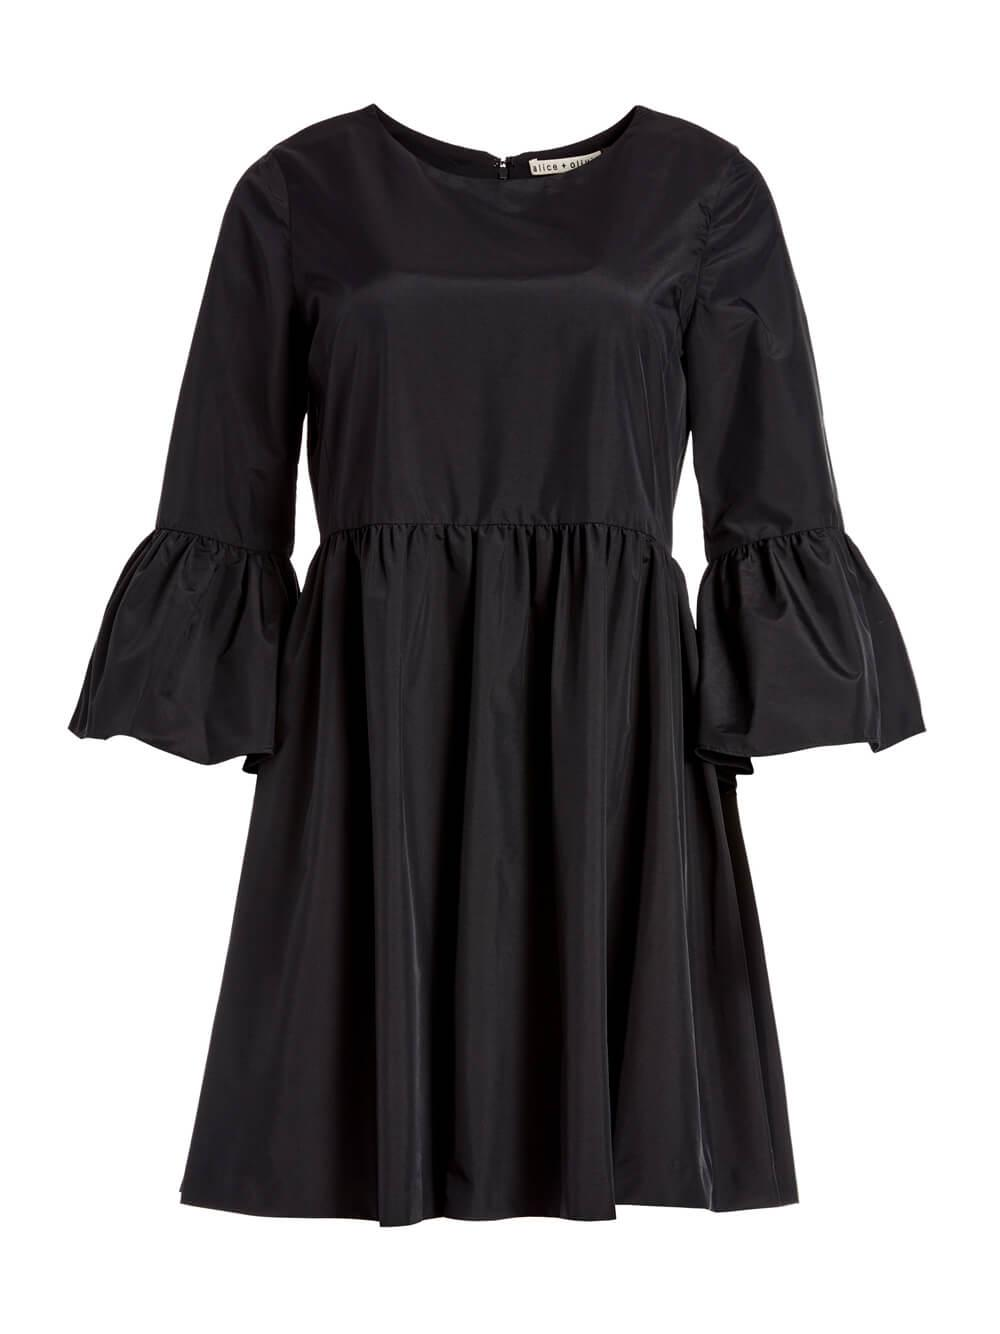 Aislyn Flutter Sleeve Dress Item # CC007A21518